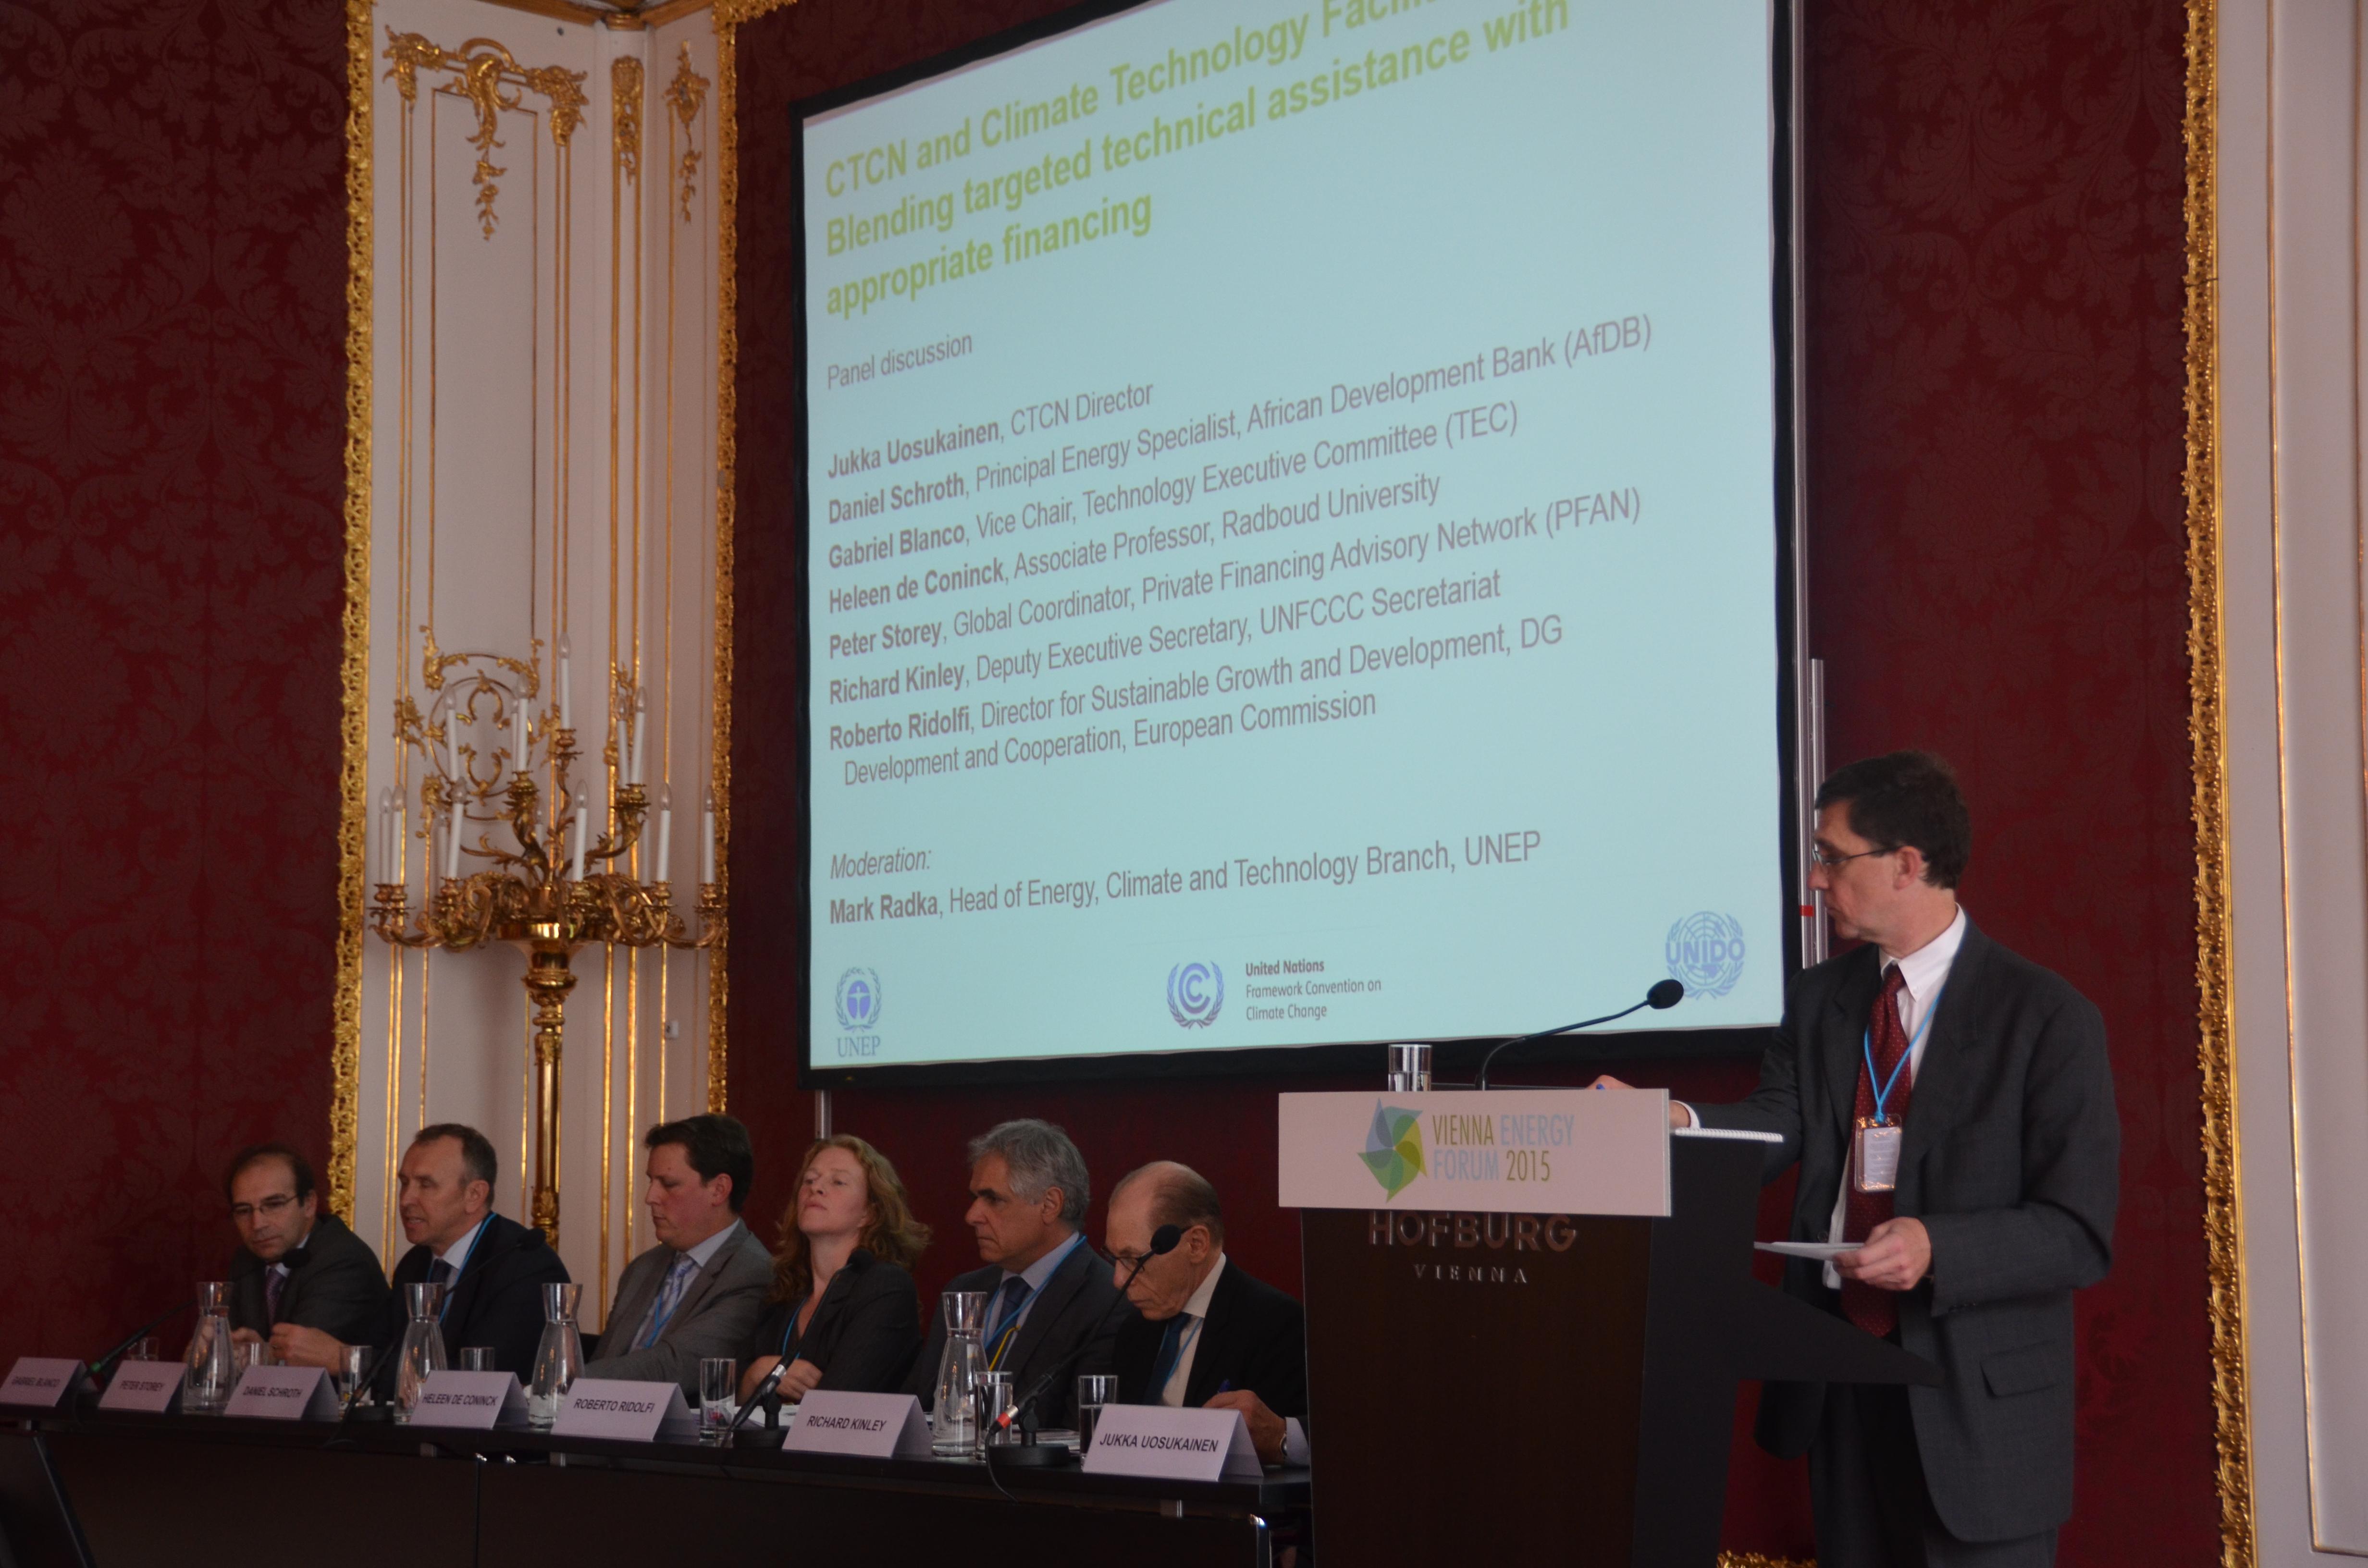 Vienna_Energy_Forum_2015 152.JPG